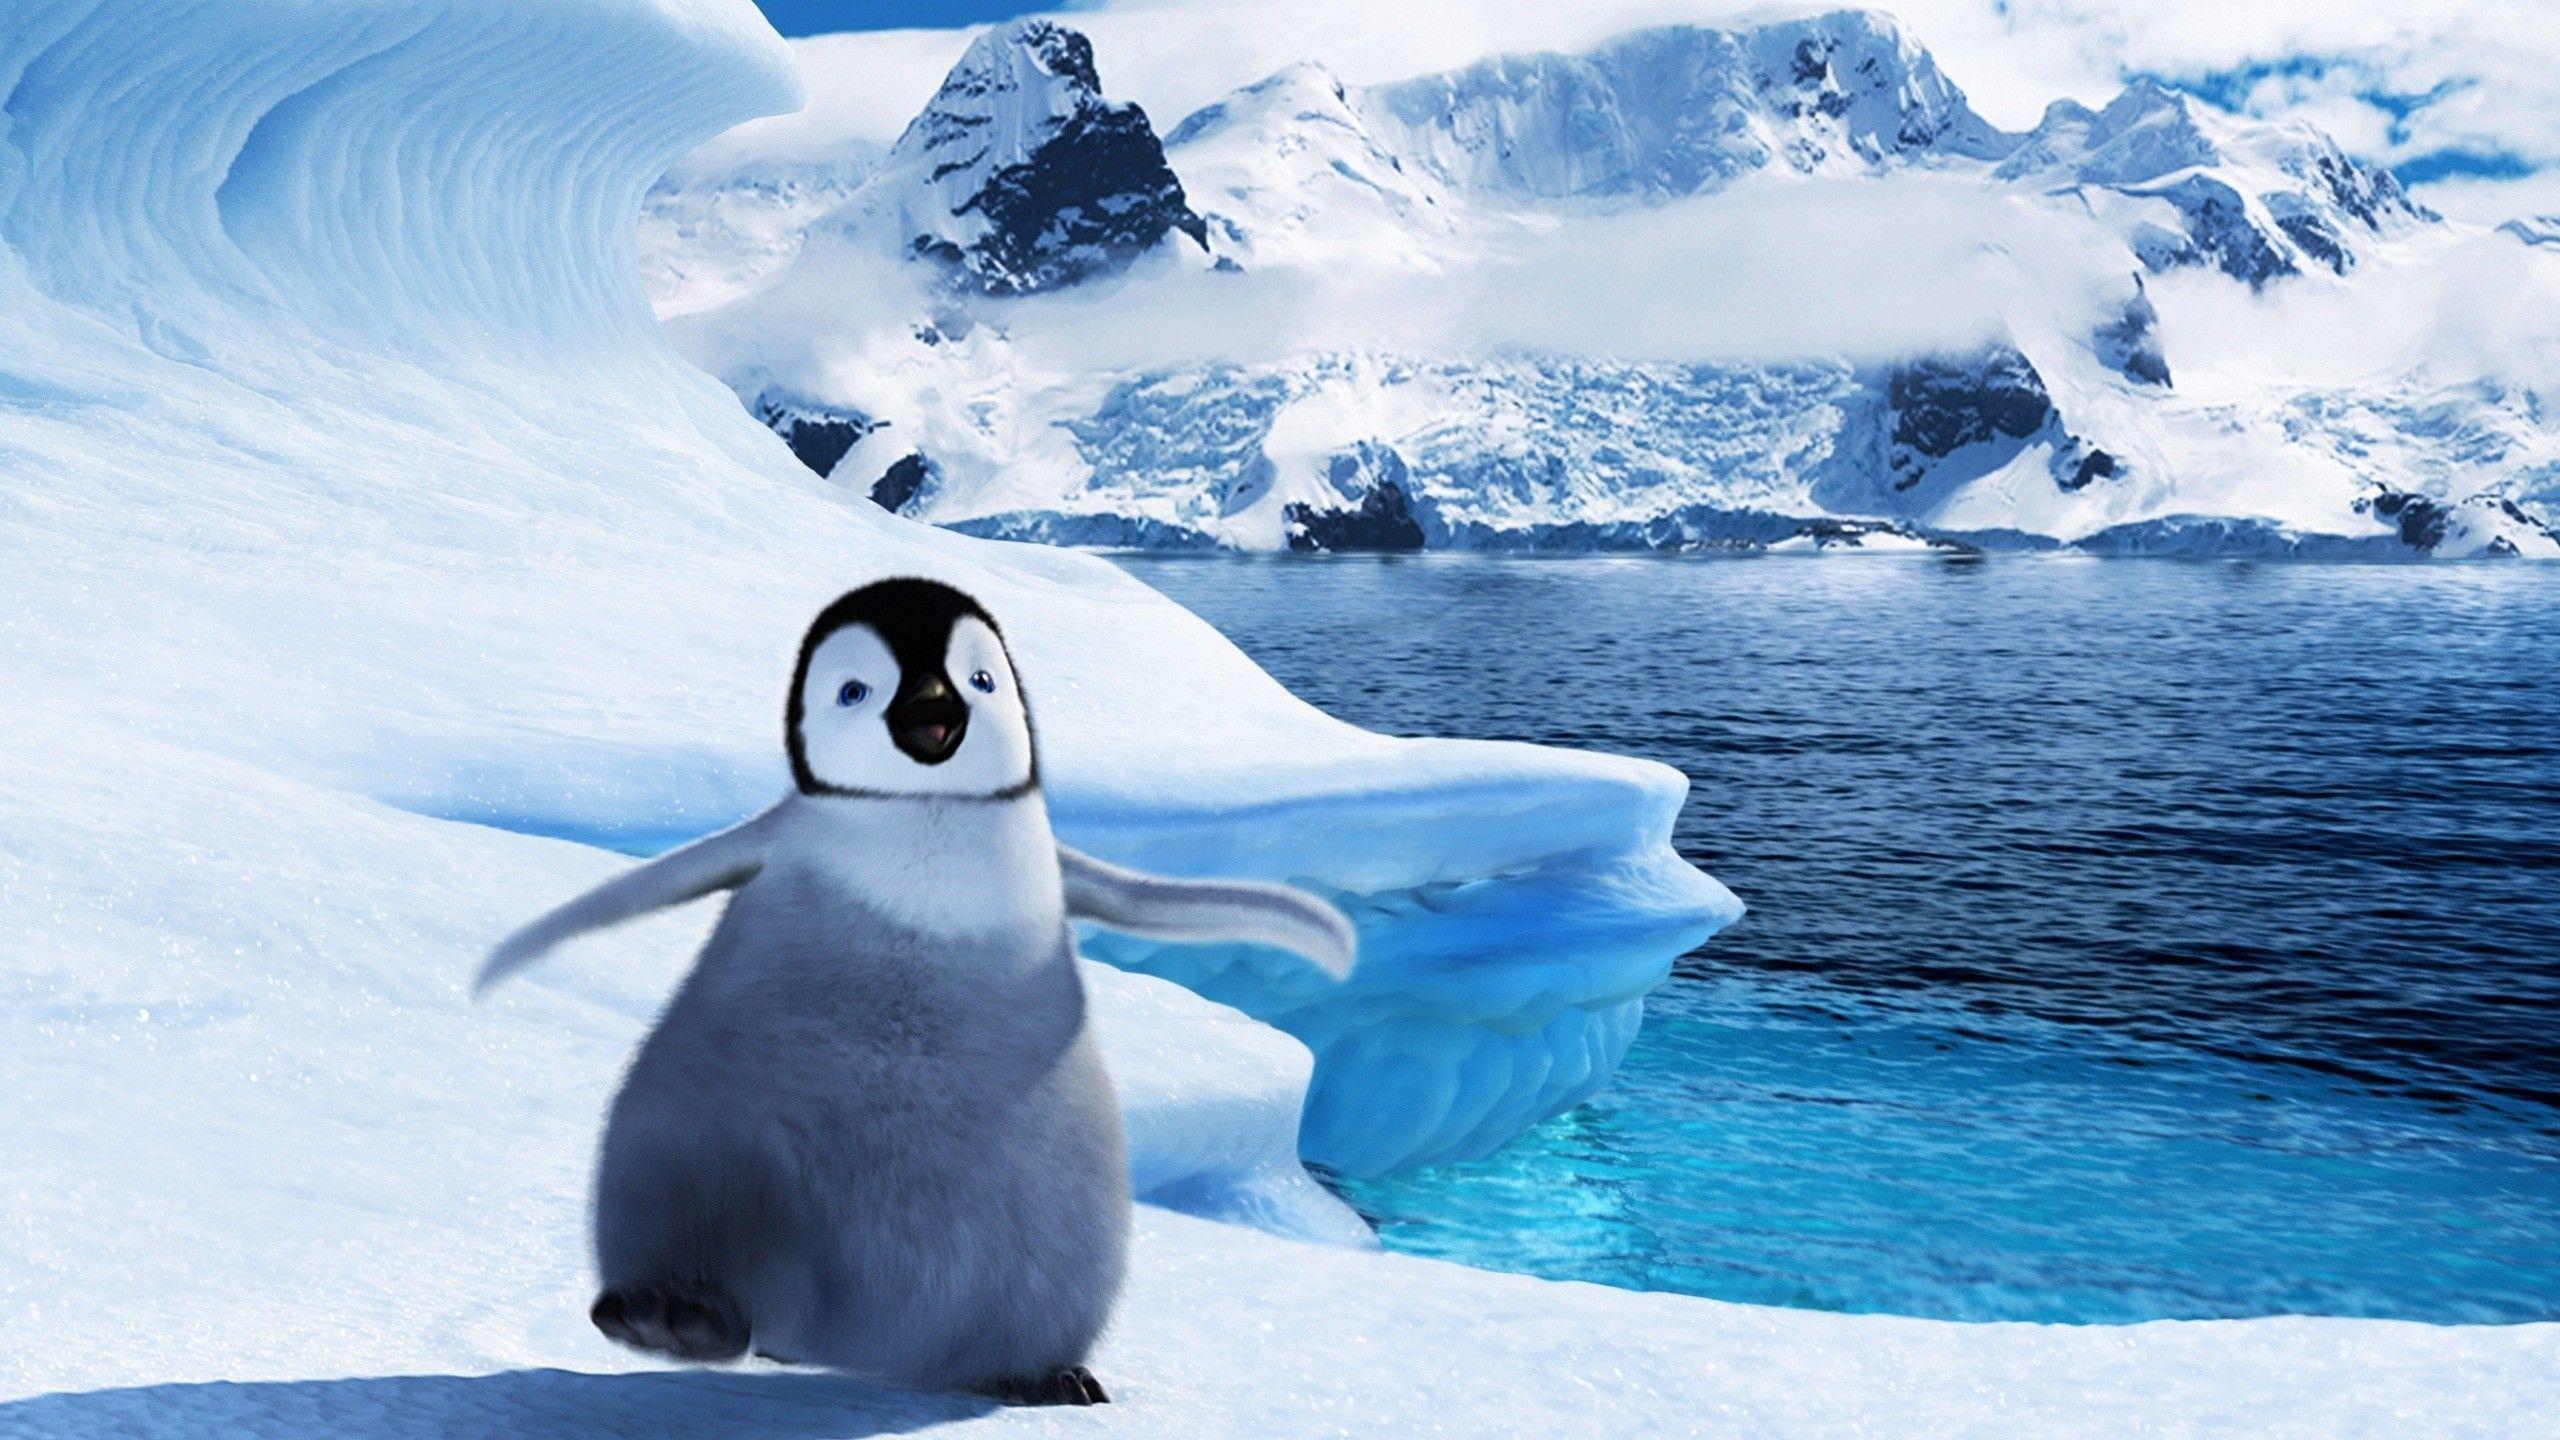 Cute Baby Penguin Pictures 6642 Wallpaper